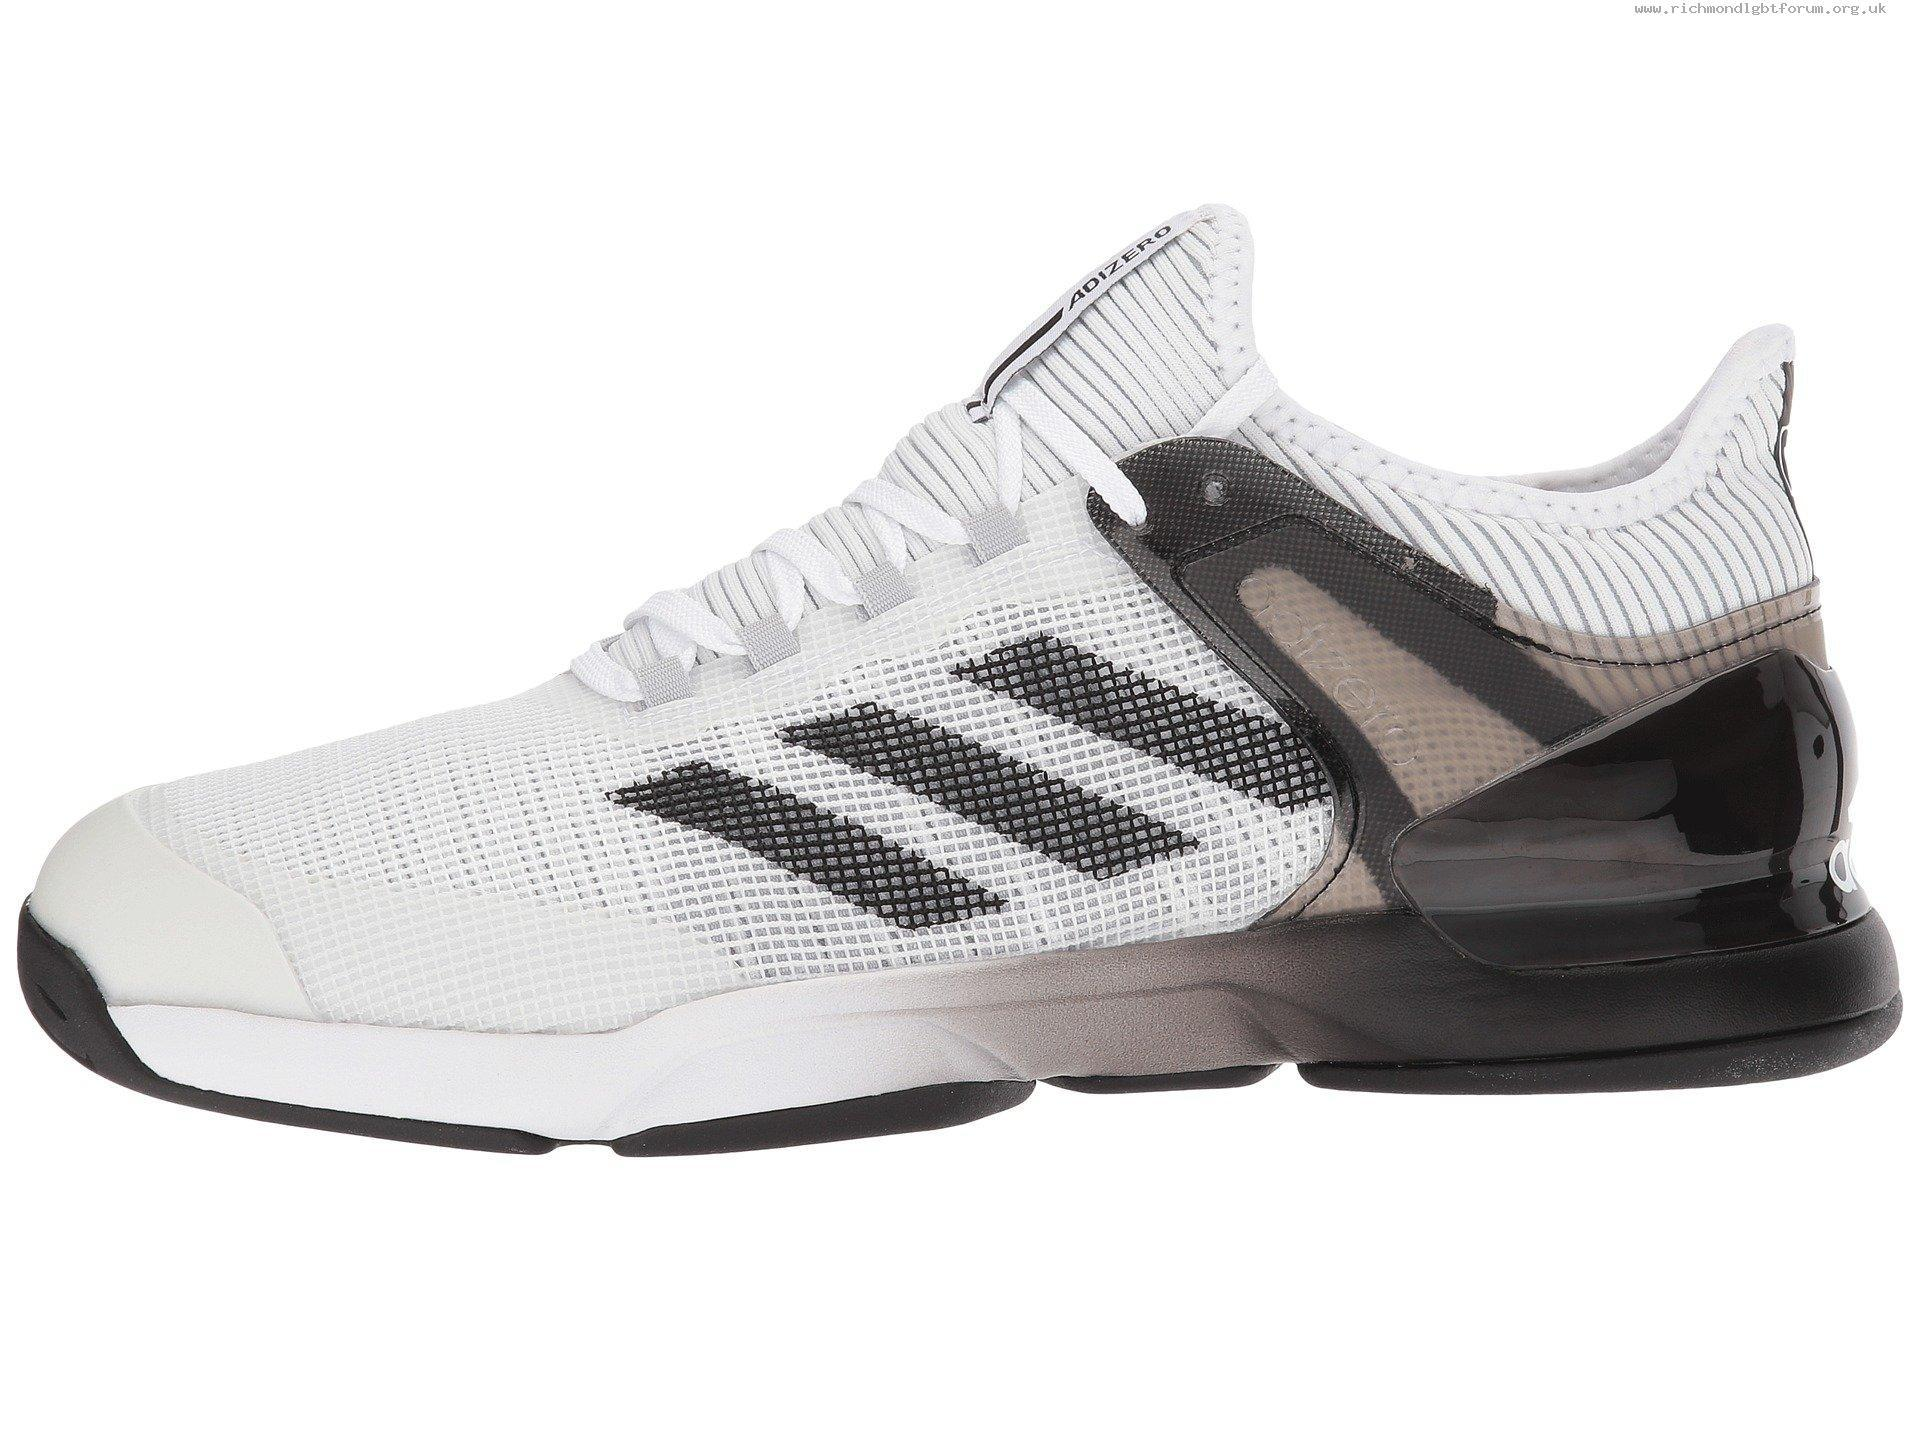 ... best price adidas mens adizero ubersonic 2.0 tennis shoes 807de 9a16a a91d6a625